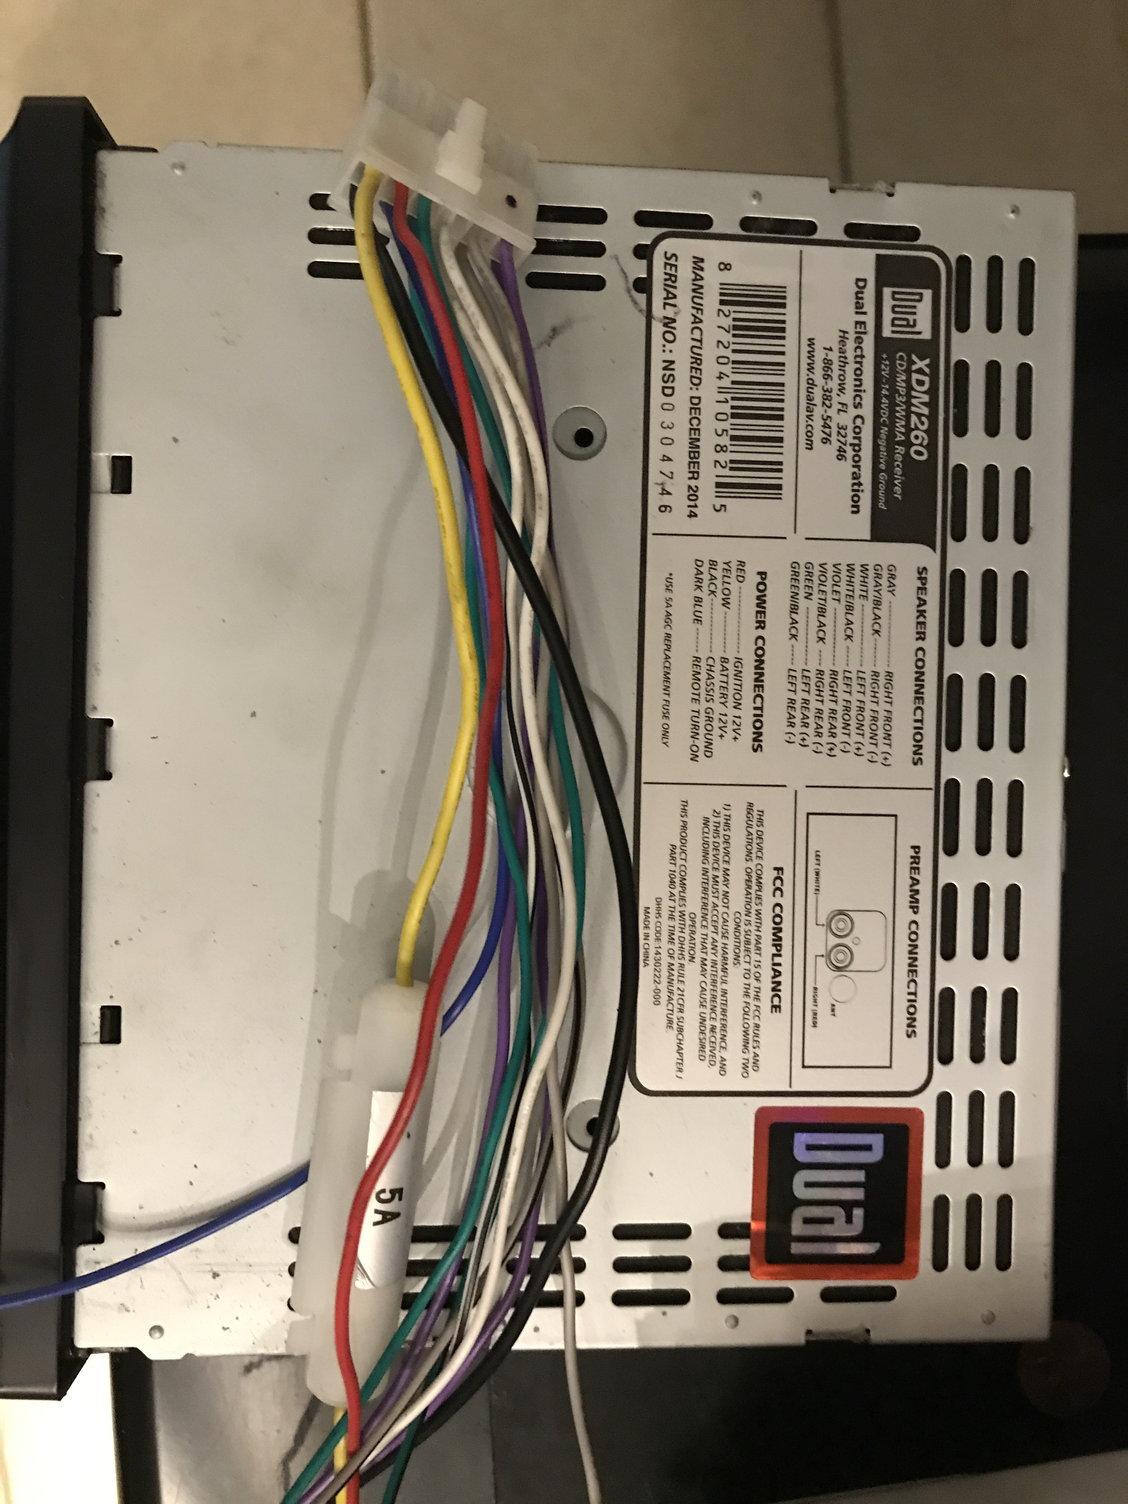 U0026 39 98 Civic Ex Stereo Wiring Question - Honda-tech